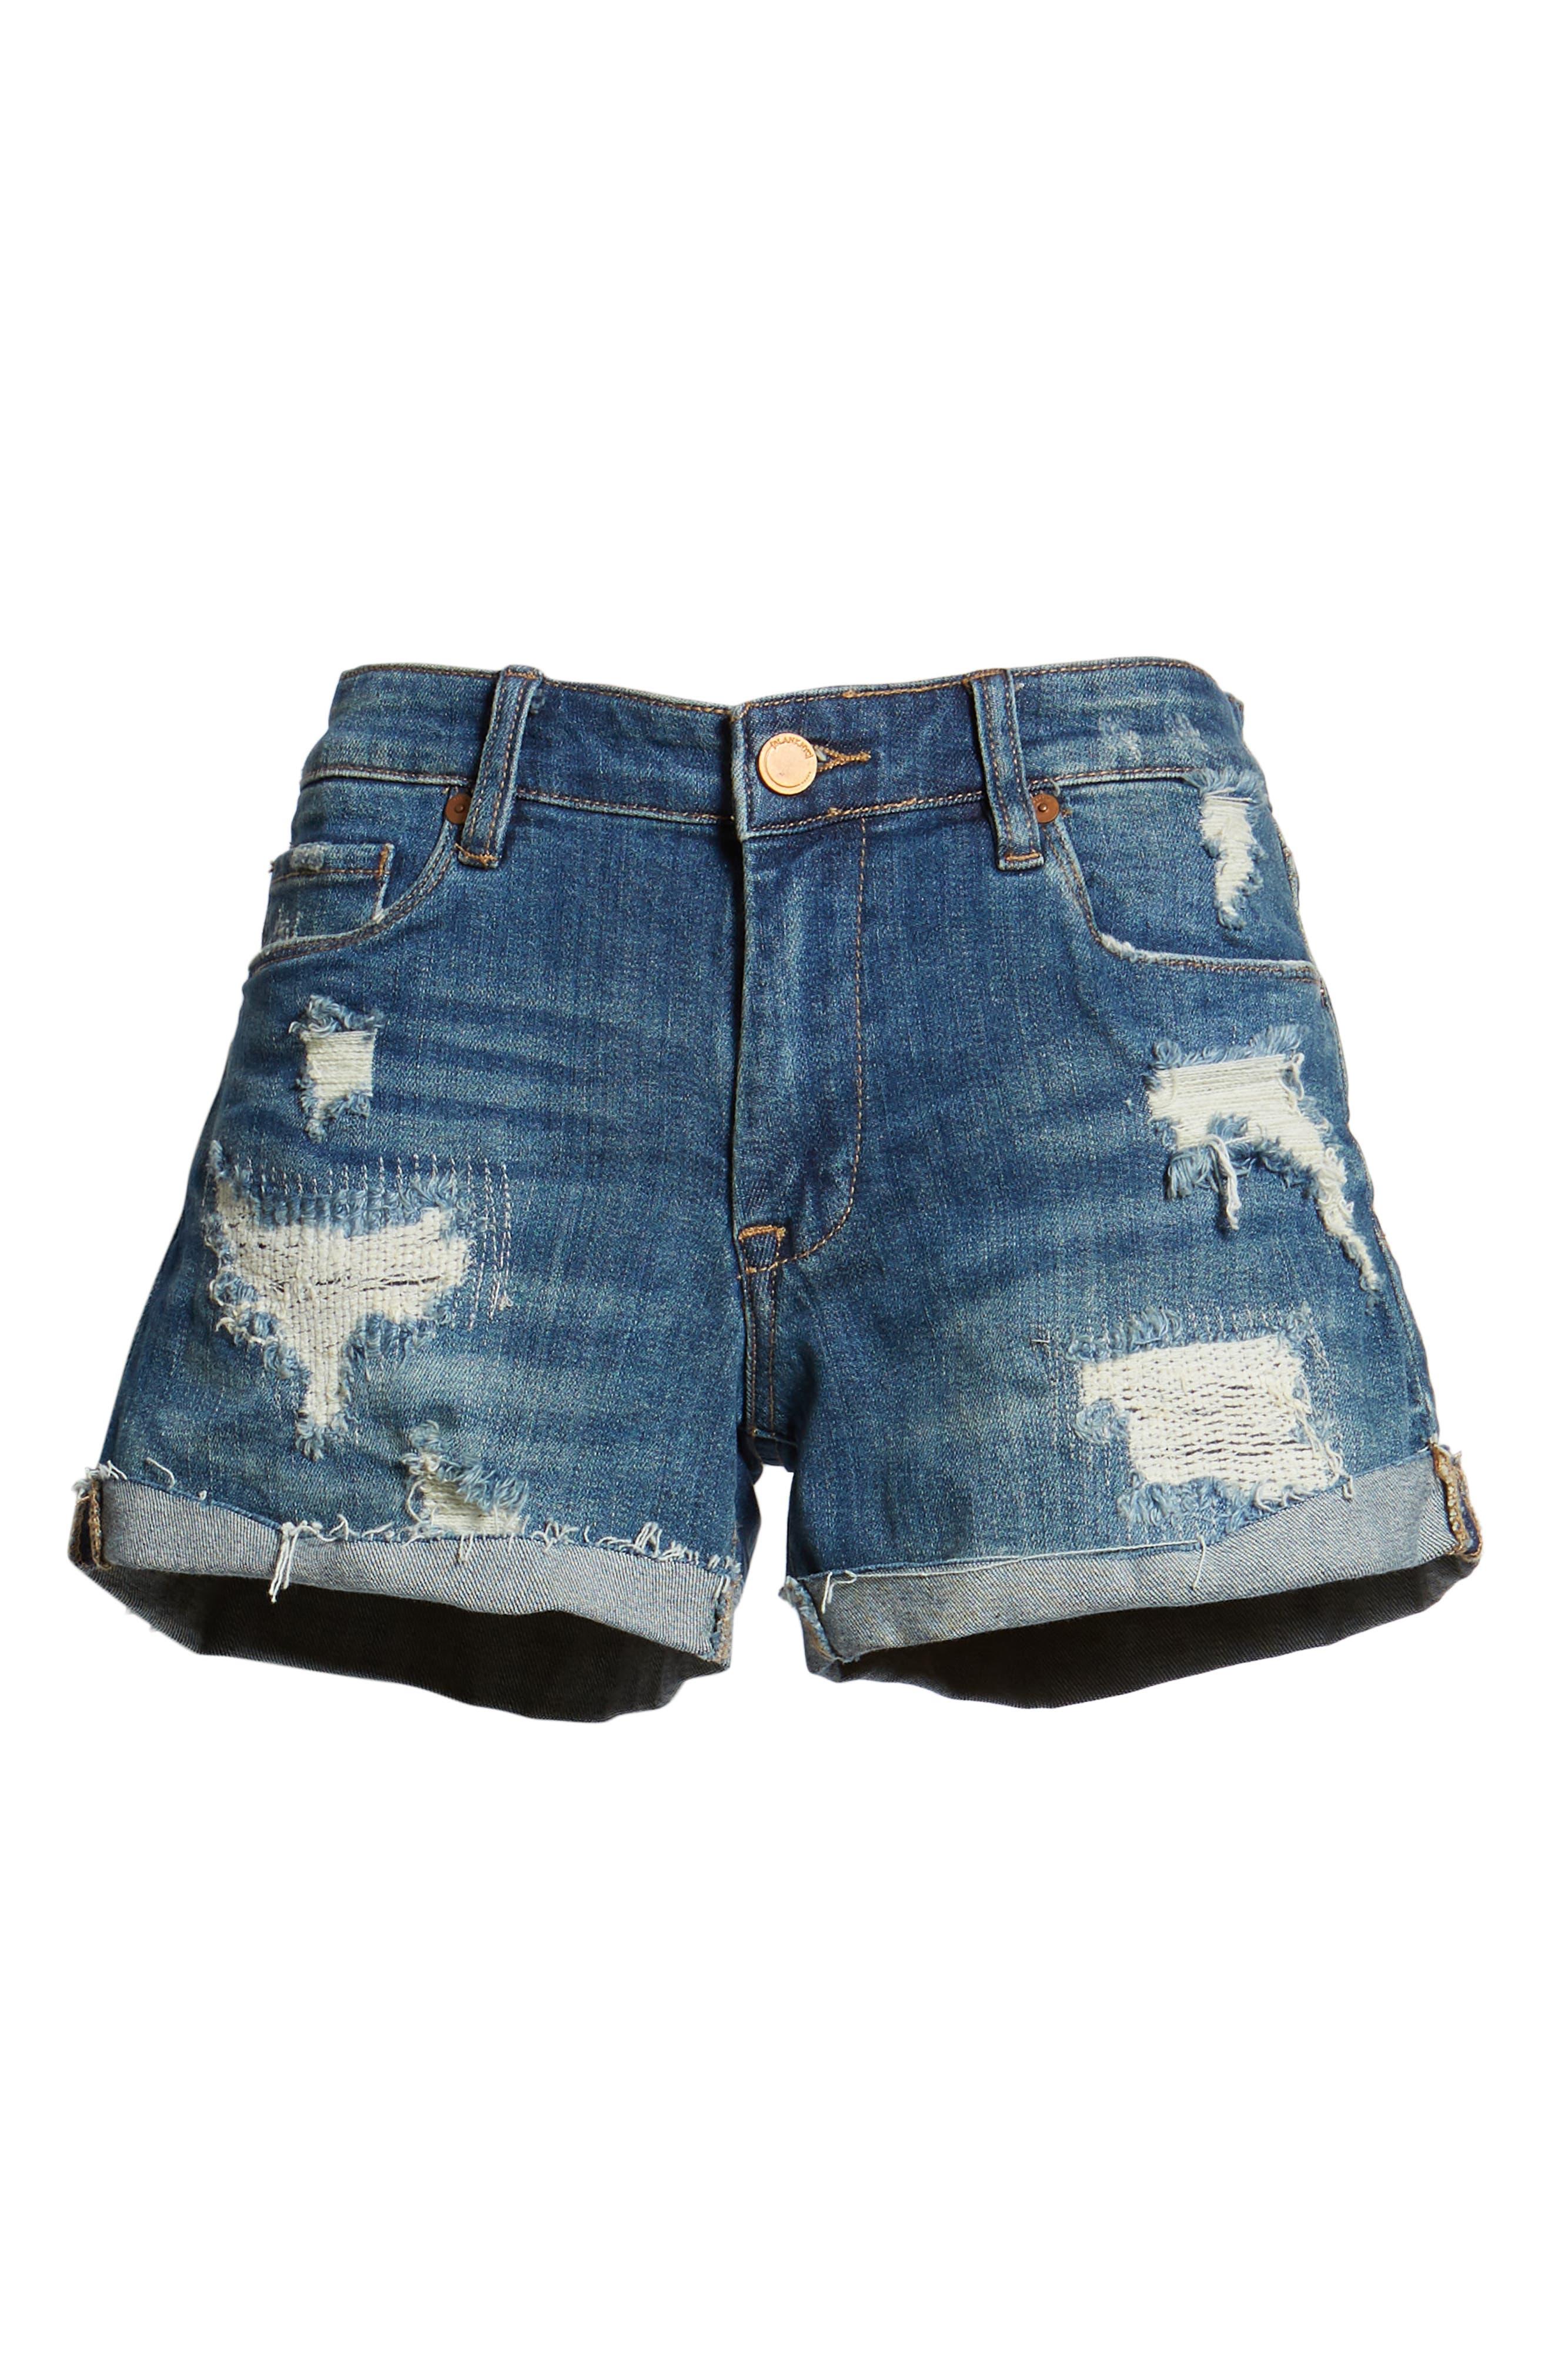 BLANKNYC, Boyfriend Denim Shorts, Alternate thumbnail 7, color, DRESS DOWN